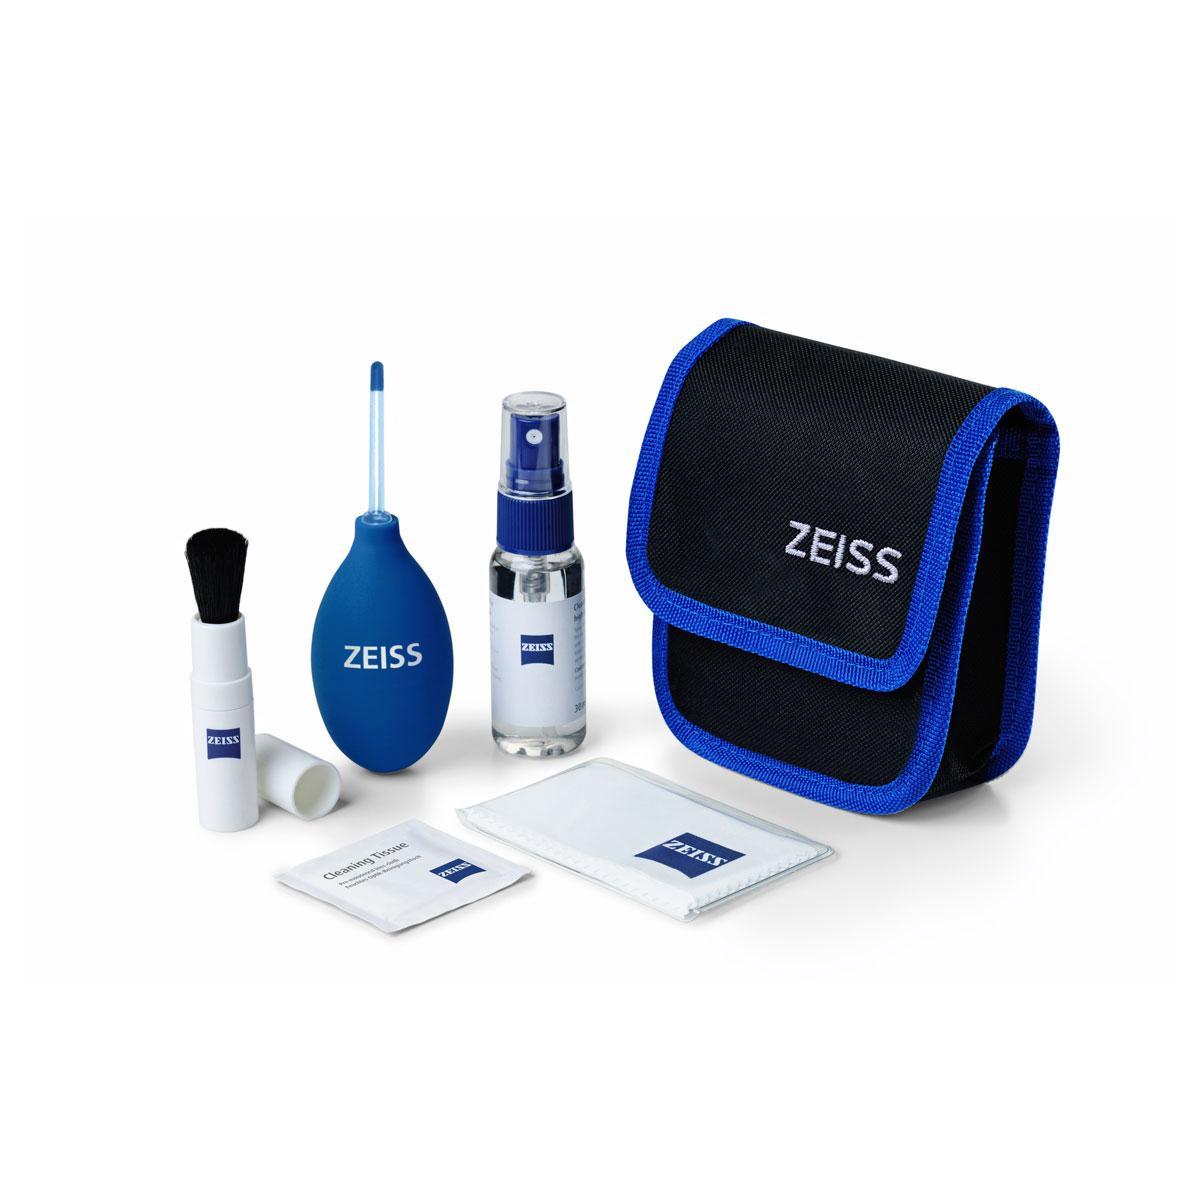 ZEISS Lens Cleaning Kit / linssinpuhdistus setti